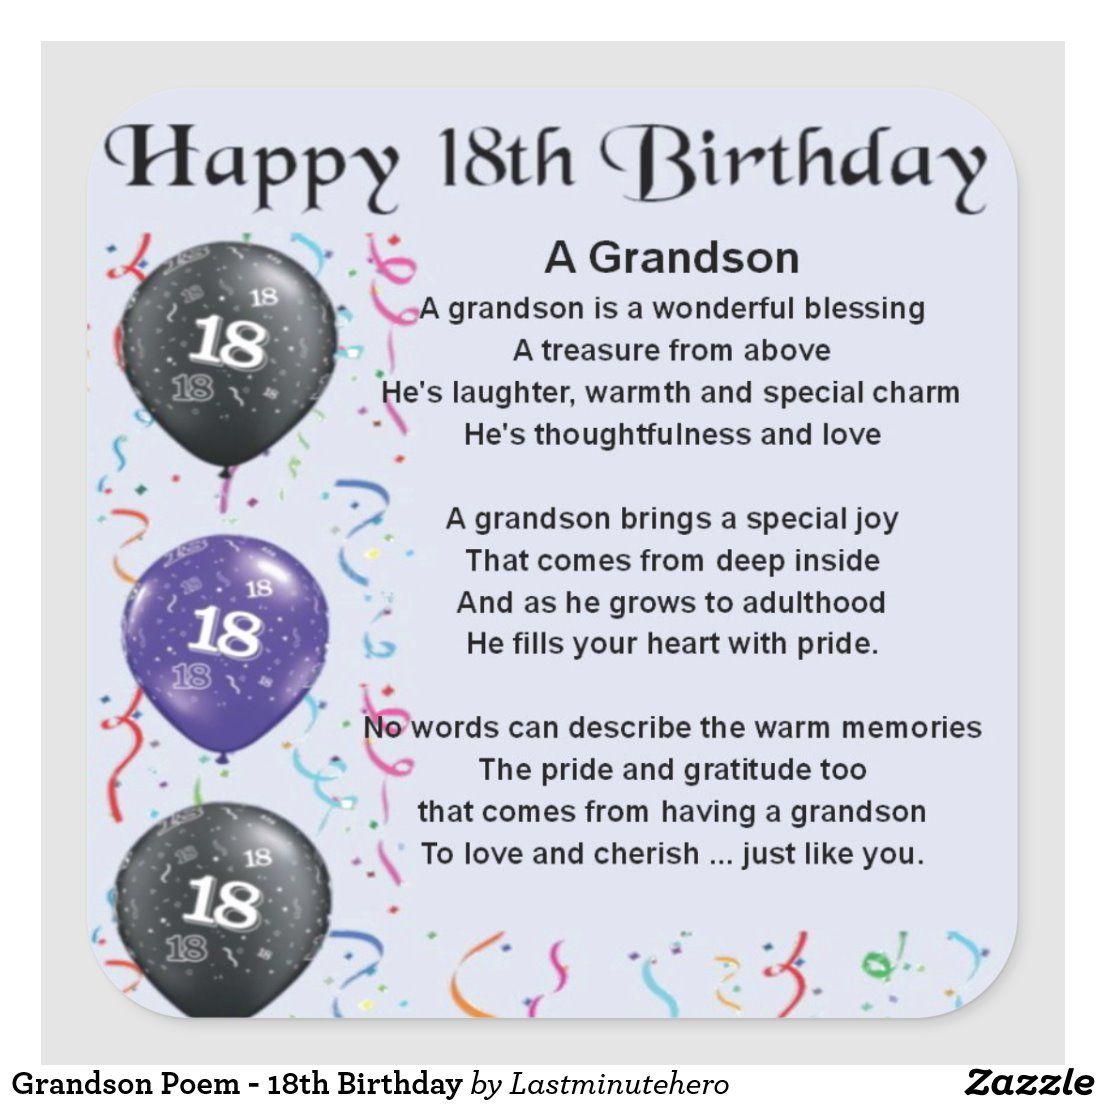 Grandson Poem 18th Birthday Square Sticker Zazzle Com Birthday Wishes For Nephew Happy 18th Birthday Son Happy 21st Birthday Wishes